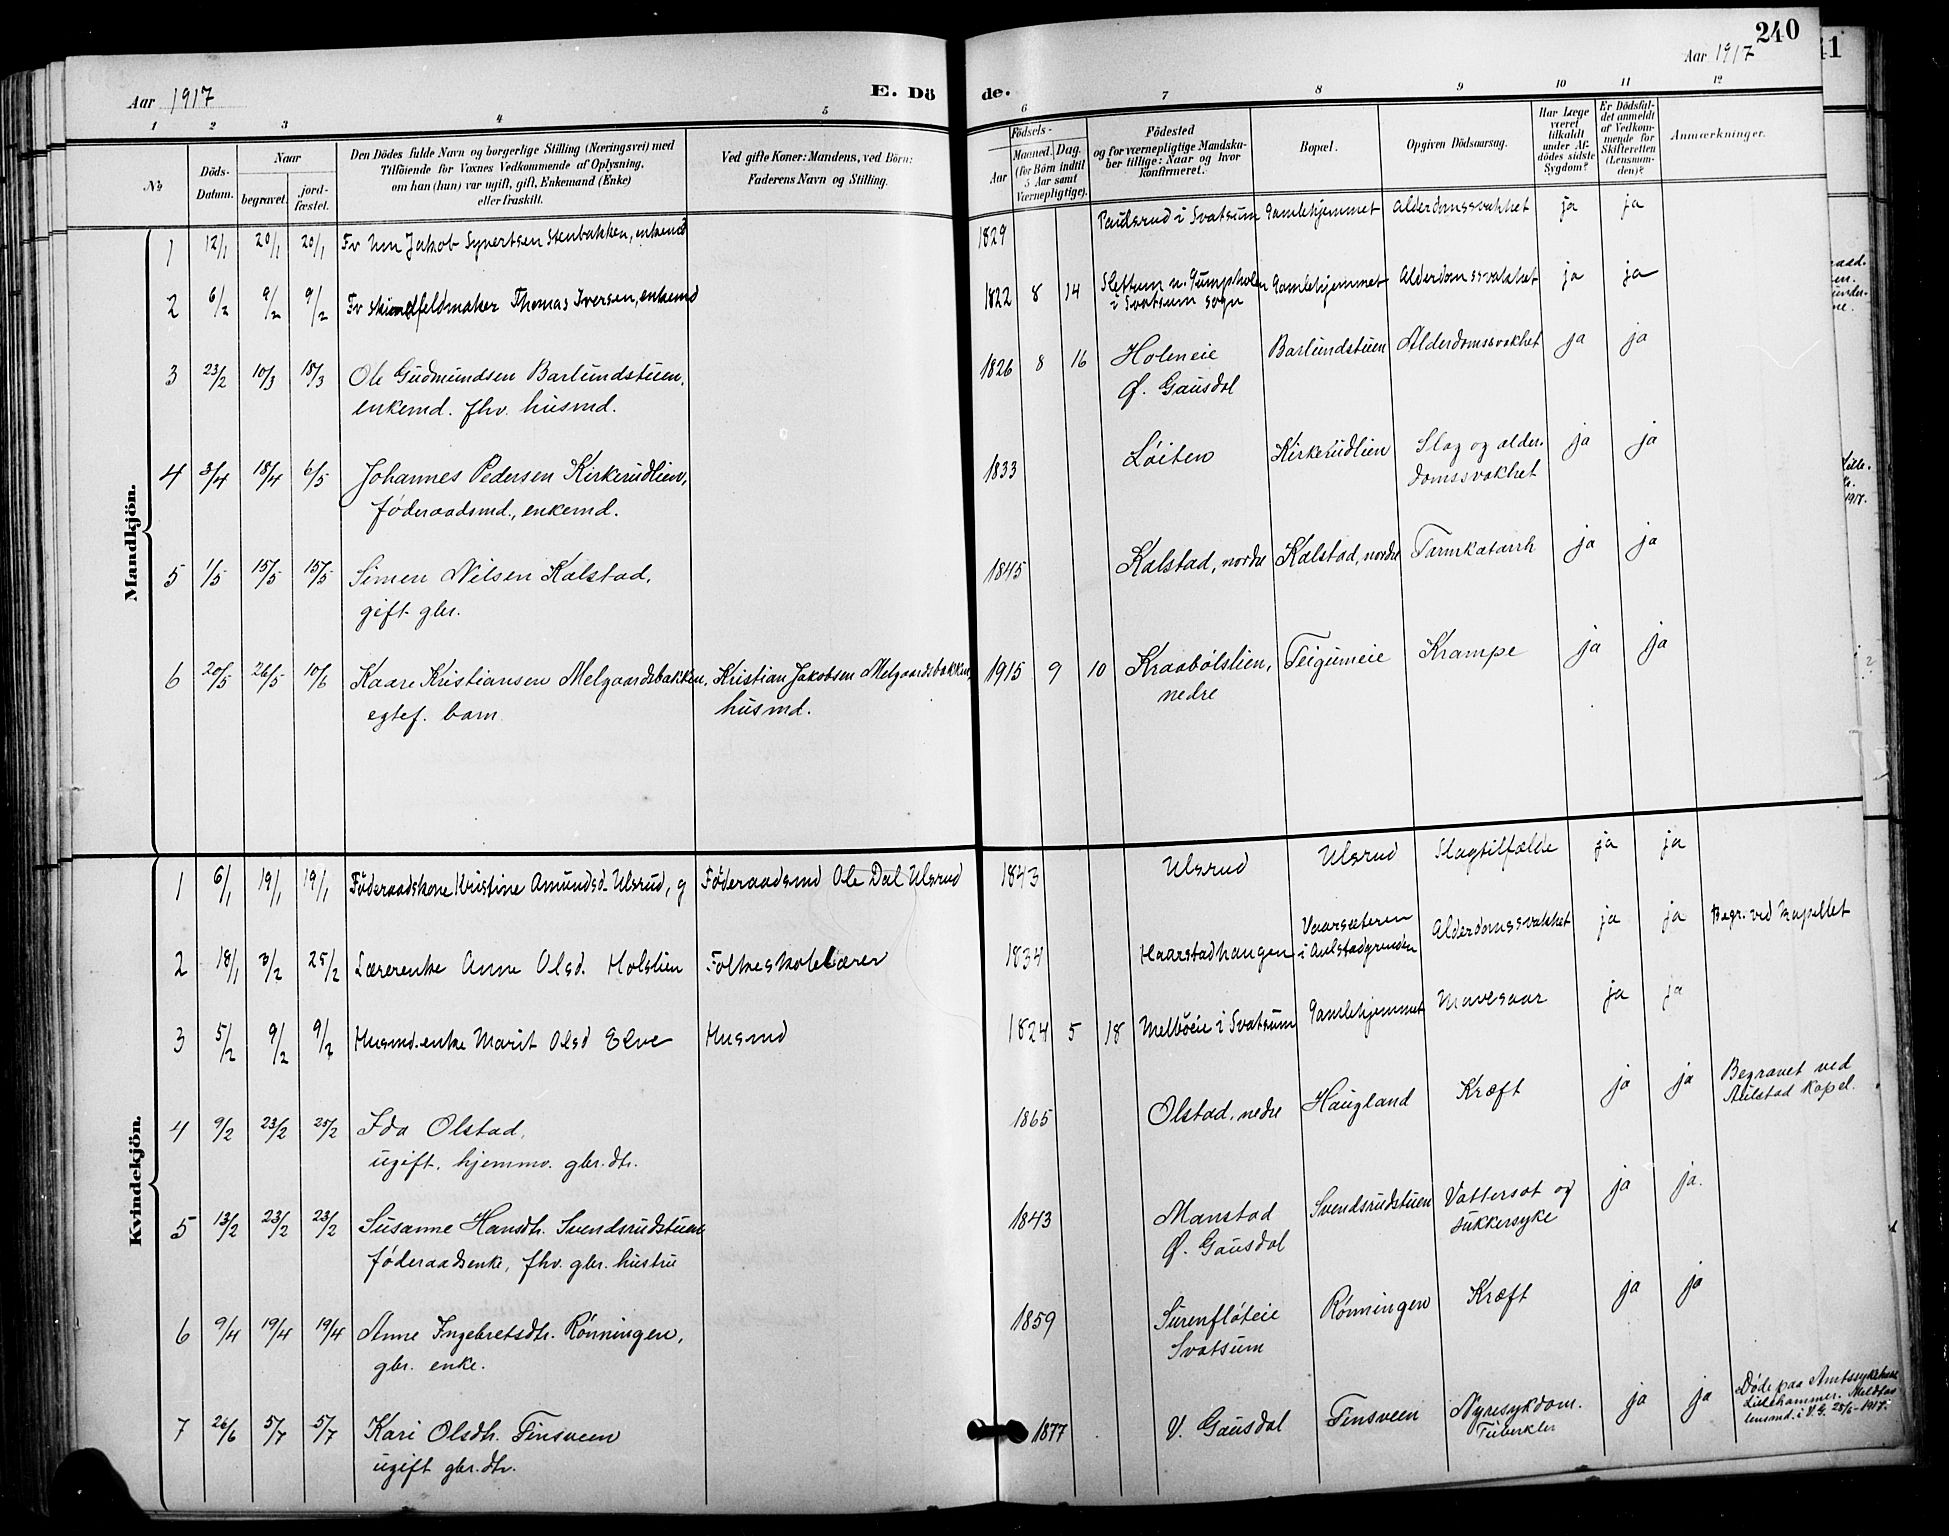 SAH, Vestre Gausdal prestekontor, Klokkerbok nr. 3, 1896-1925, s. 240